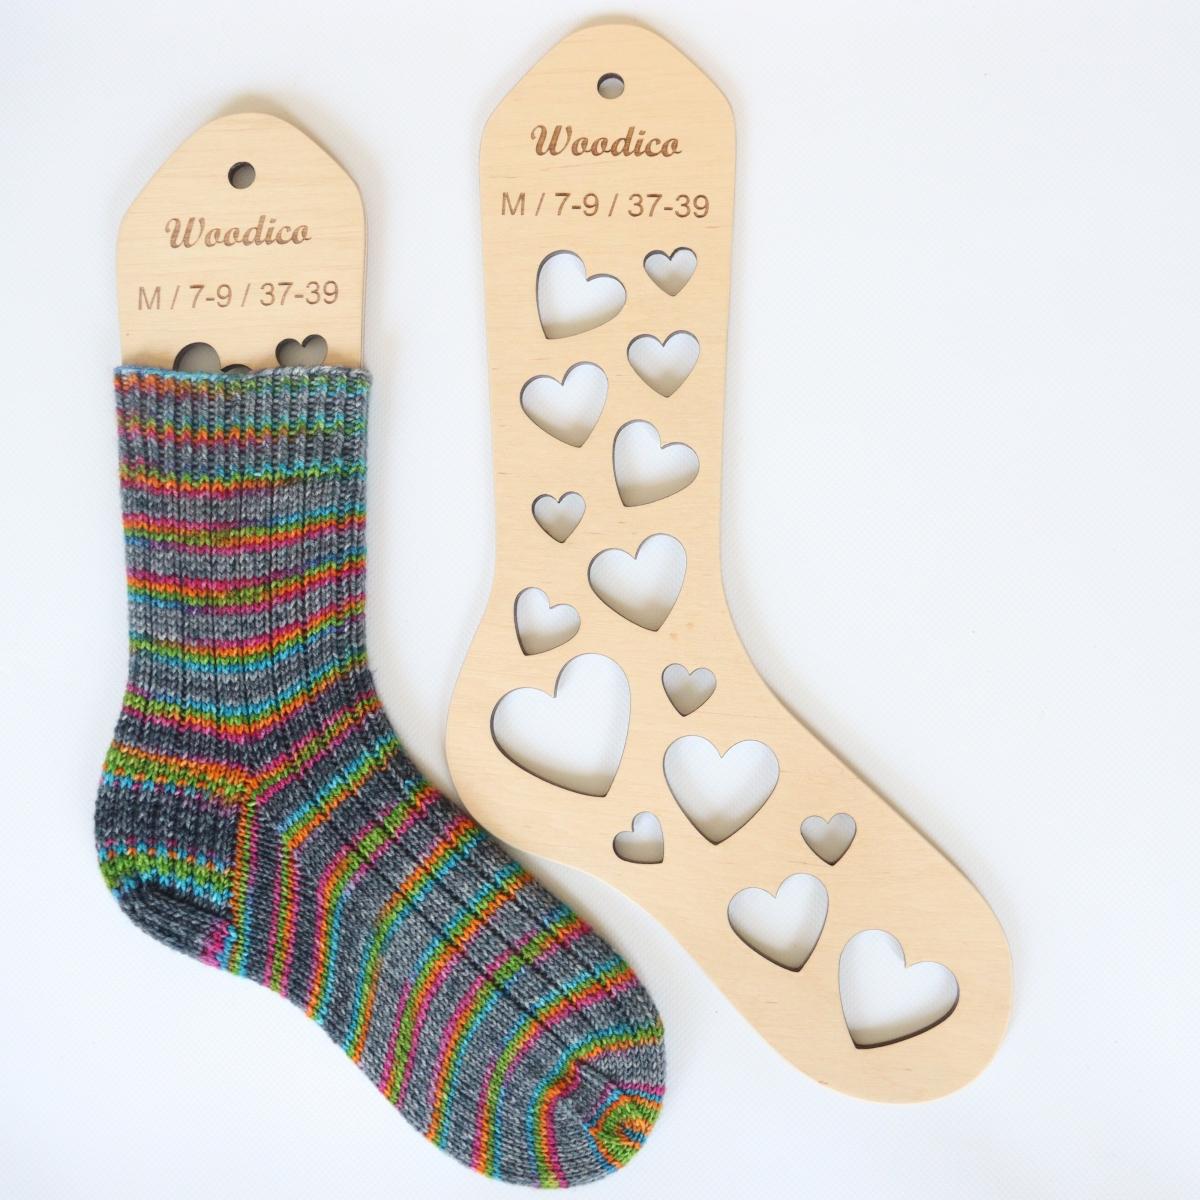 woodico.pro wooden sock blockers hearts 9 1200x1200 - Wooden sock blockers / Hearts